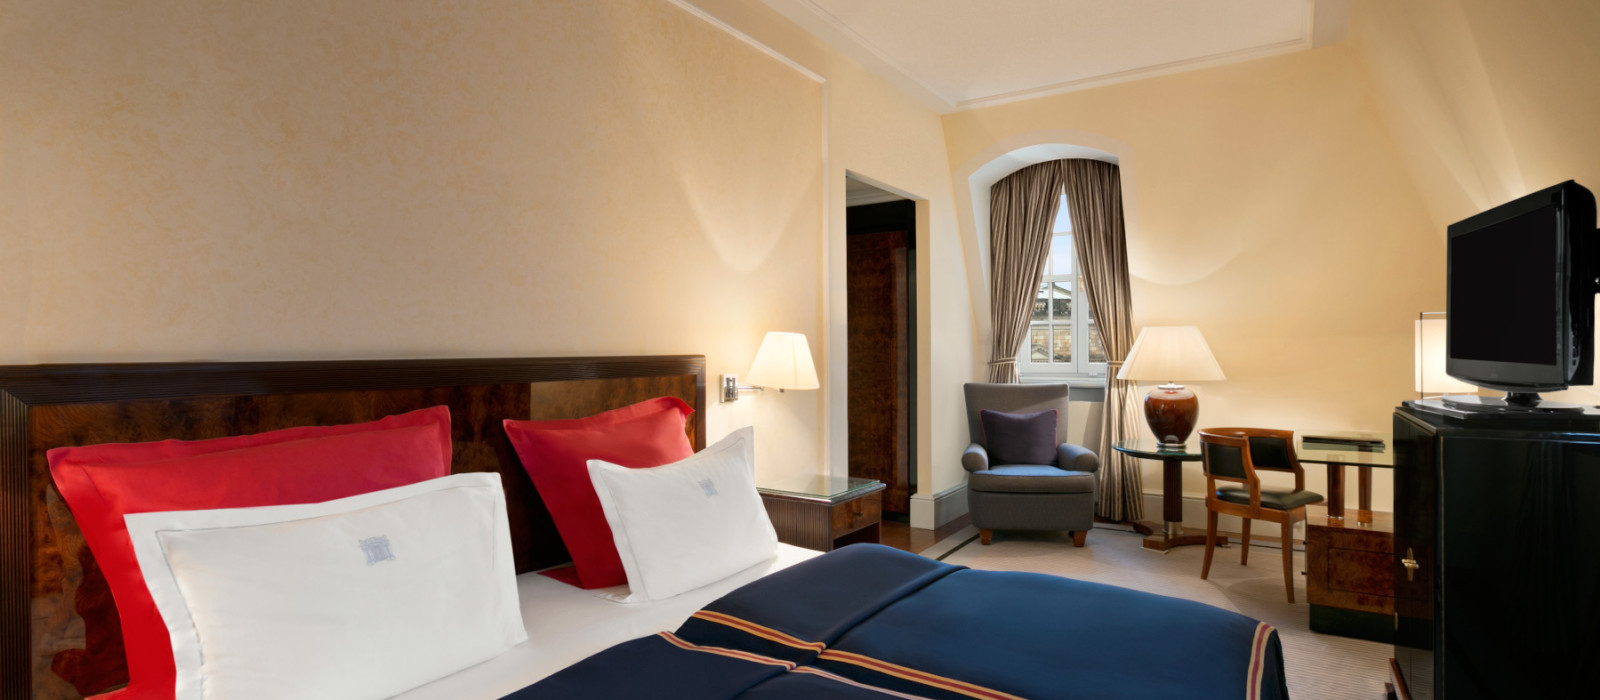 Hotel  Taschenbergpalais Kempinski Dresden Germany